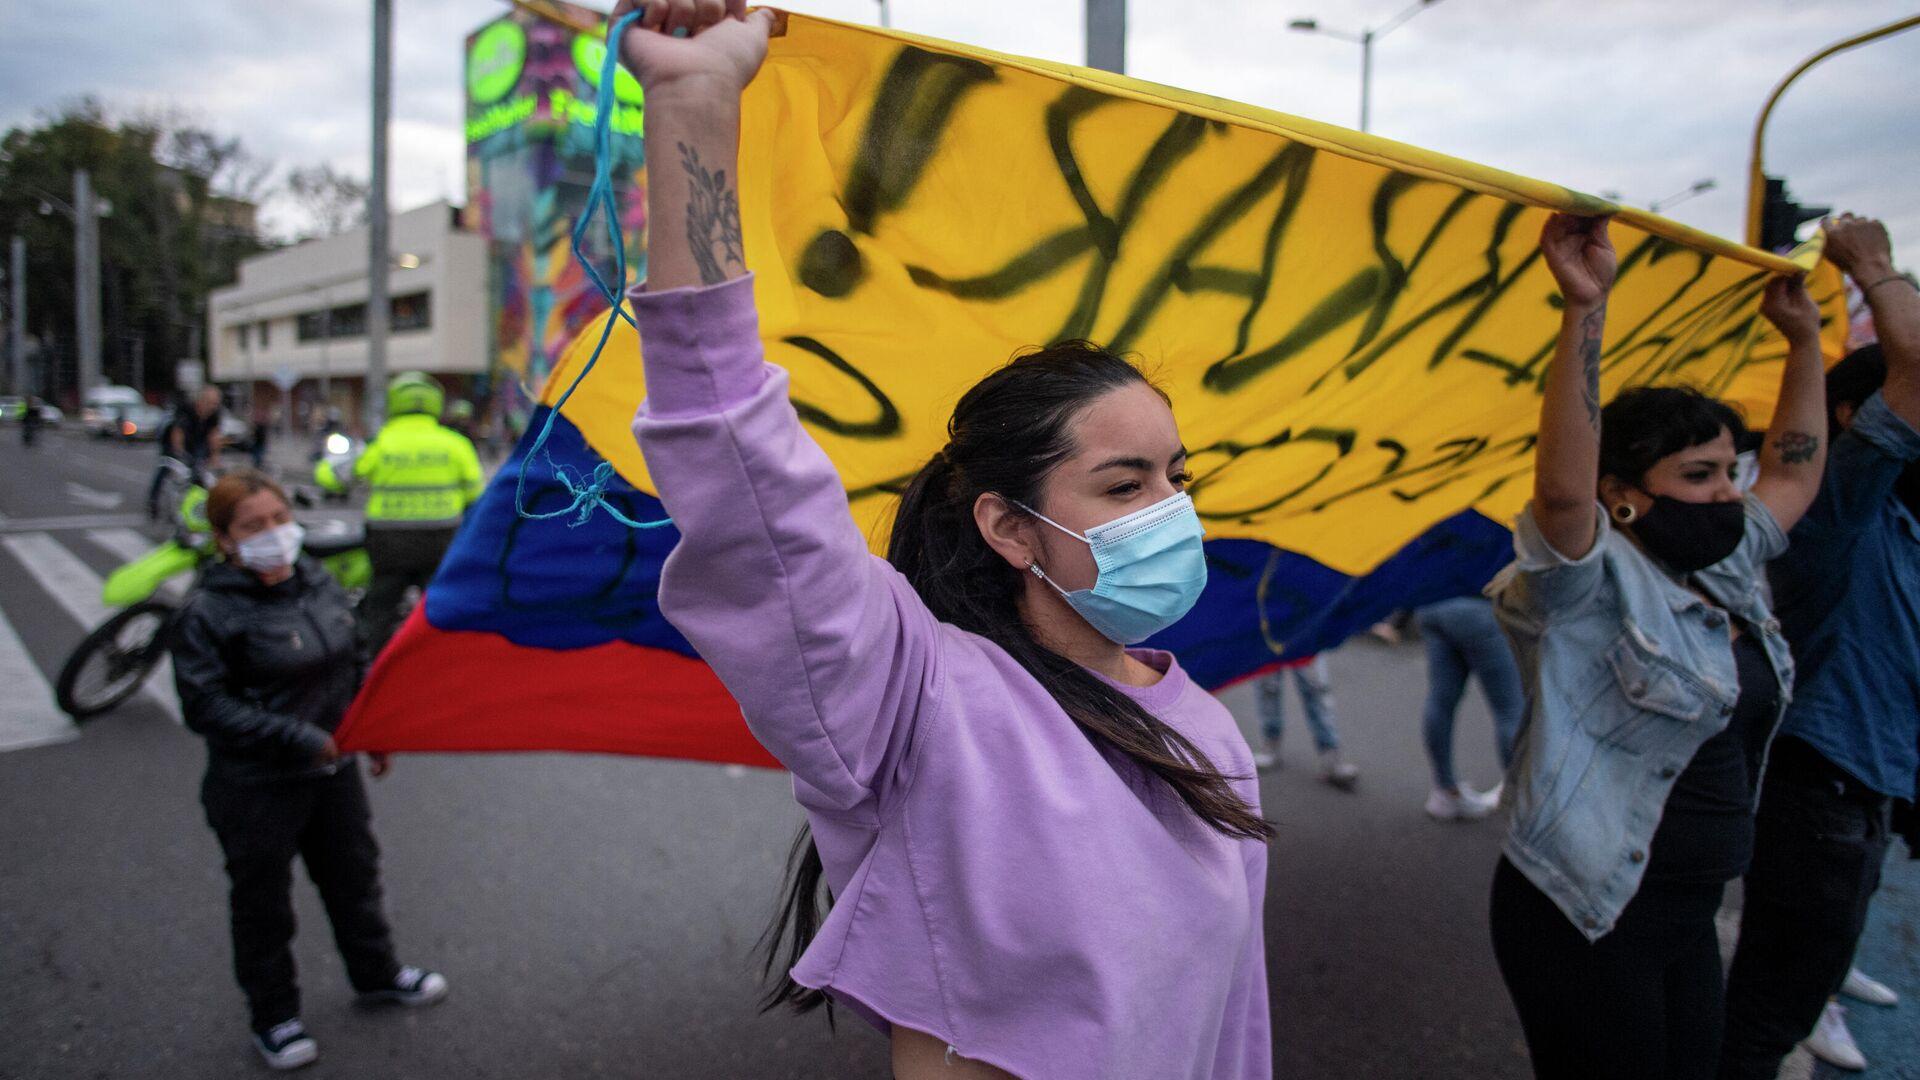 Manifestación en Bogotá, Colombia - Sputnik Mundo, 1920, 16.05.2021